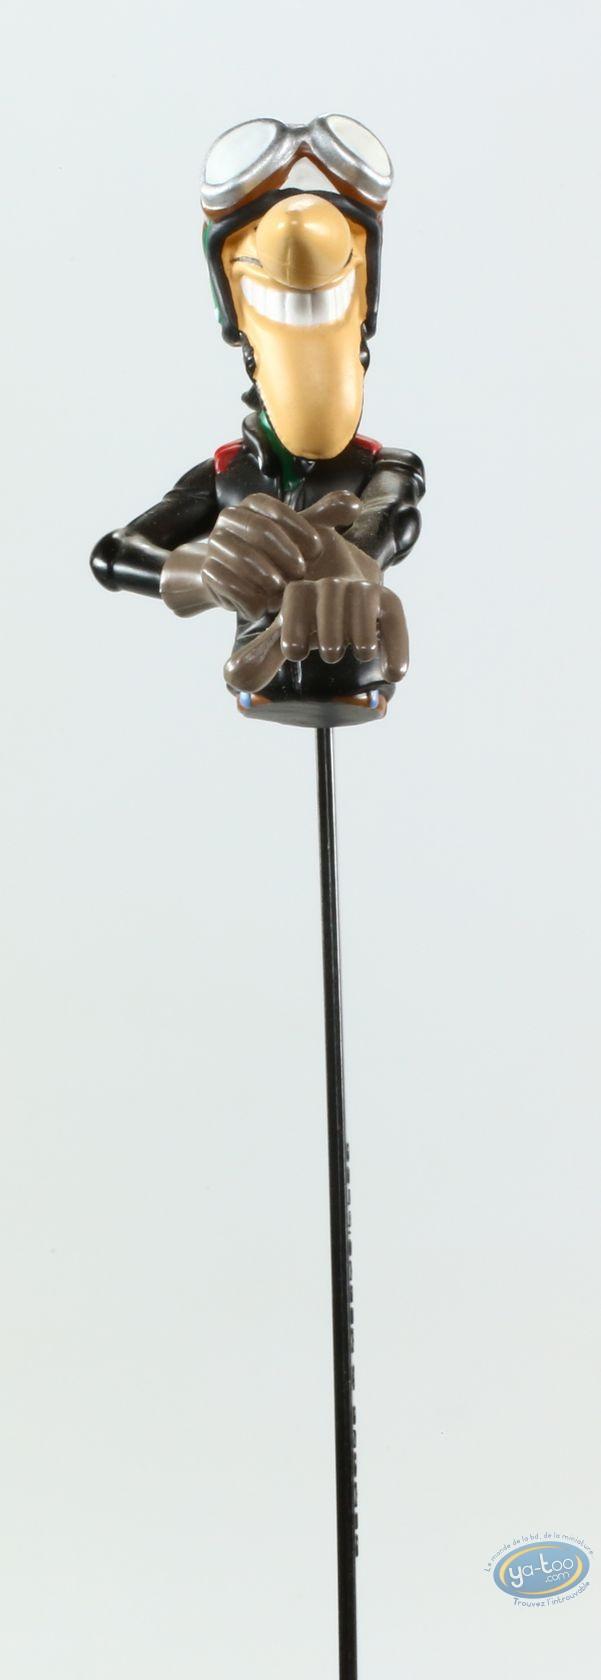 Fourniture bureau, Joe Bar Team : Marque page, Brasletti